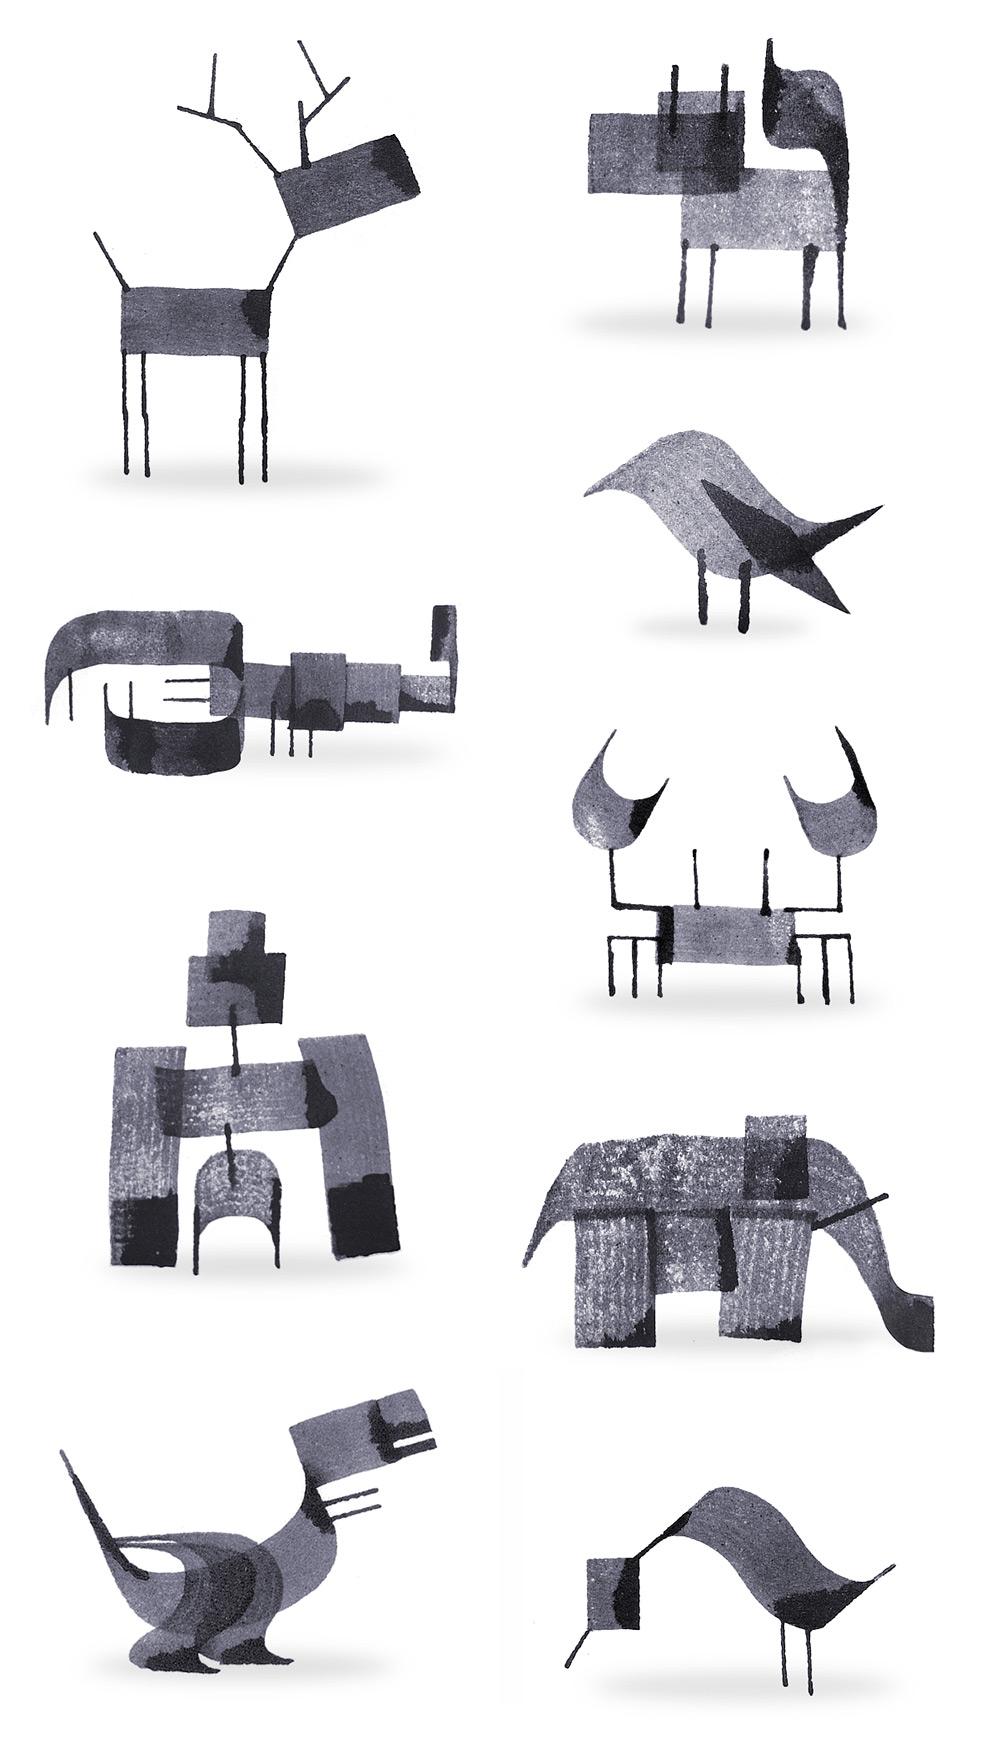 tipografando-animali-penna-stilografica